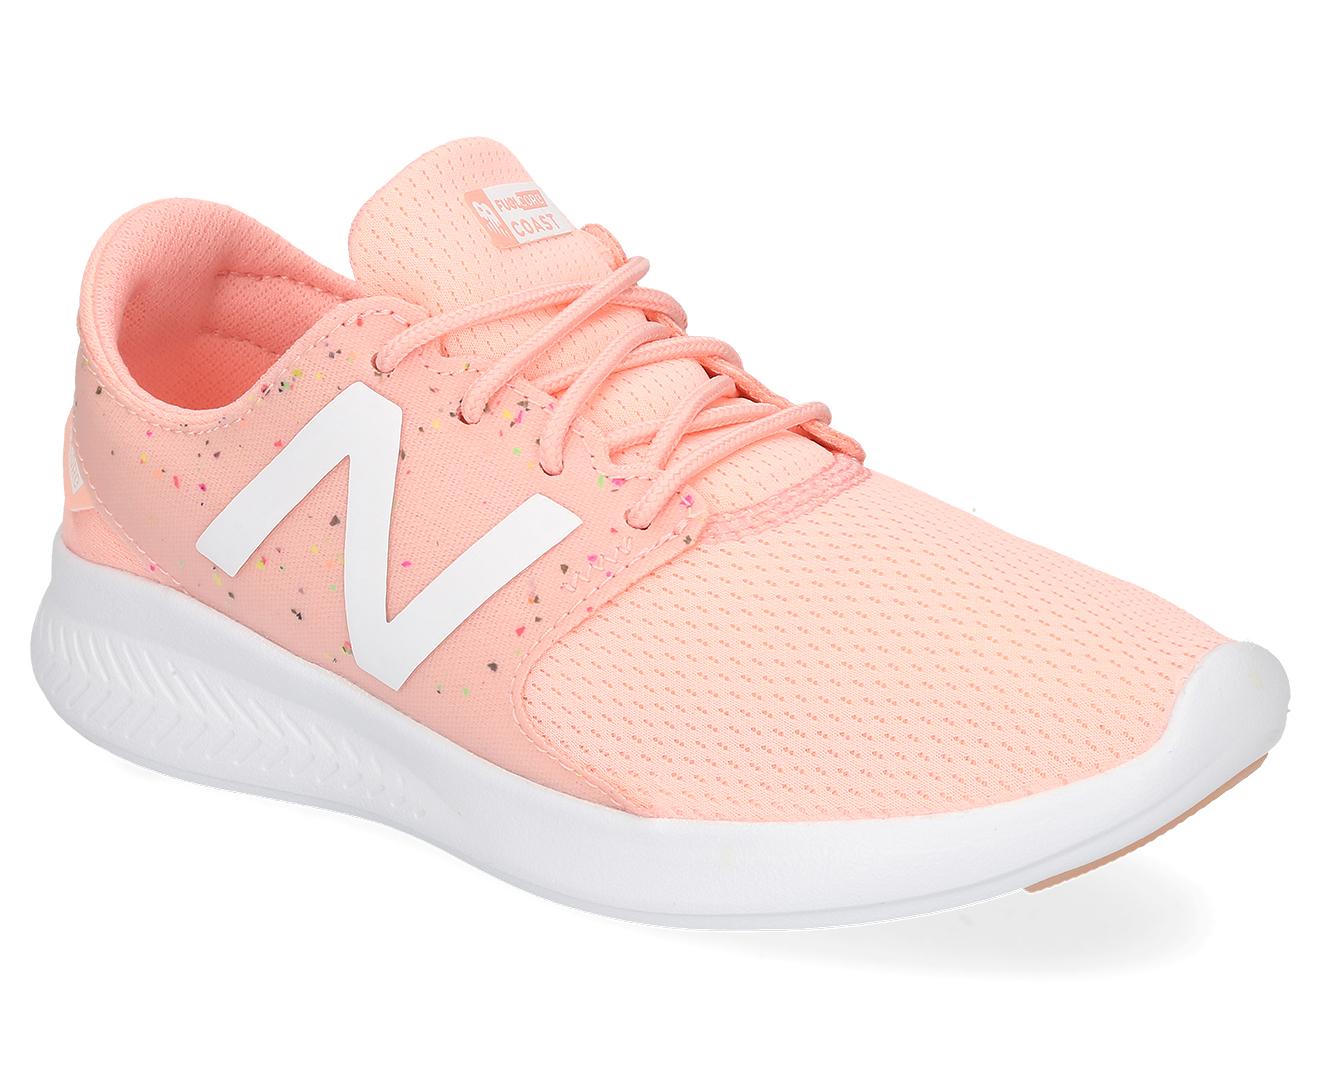 cea3e5caea6 New Balance Girls  Pre-School Fuelcore Coast V3 Shoe - Himalayan  Pink Confetti